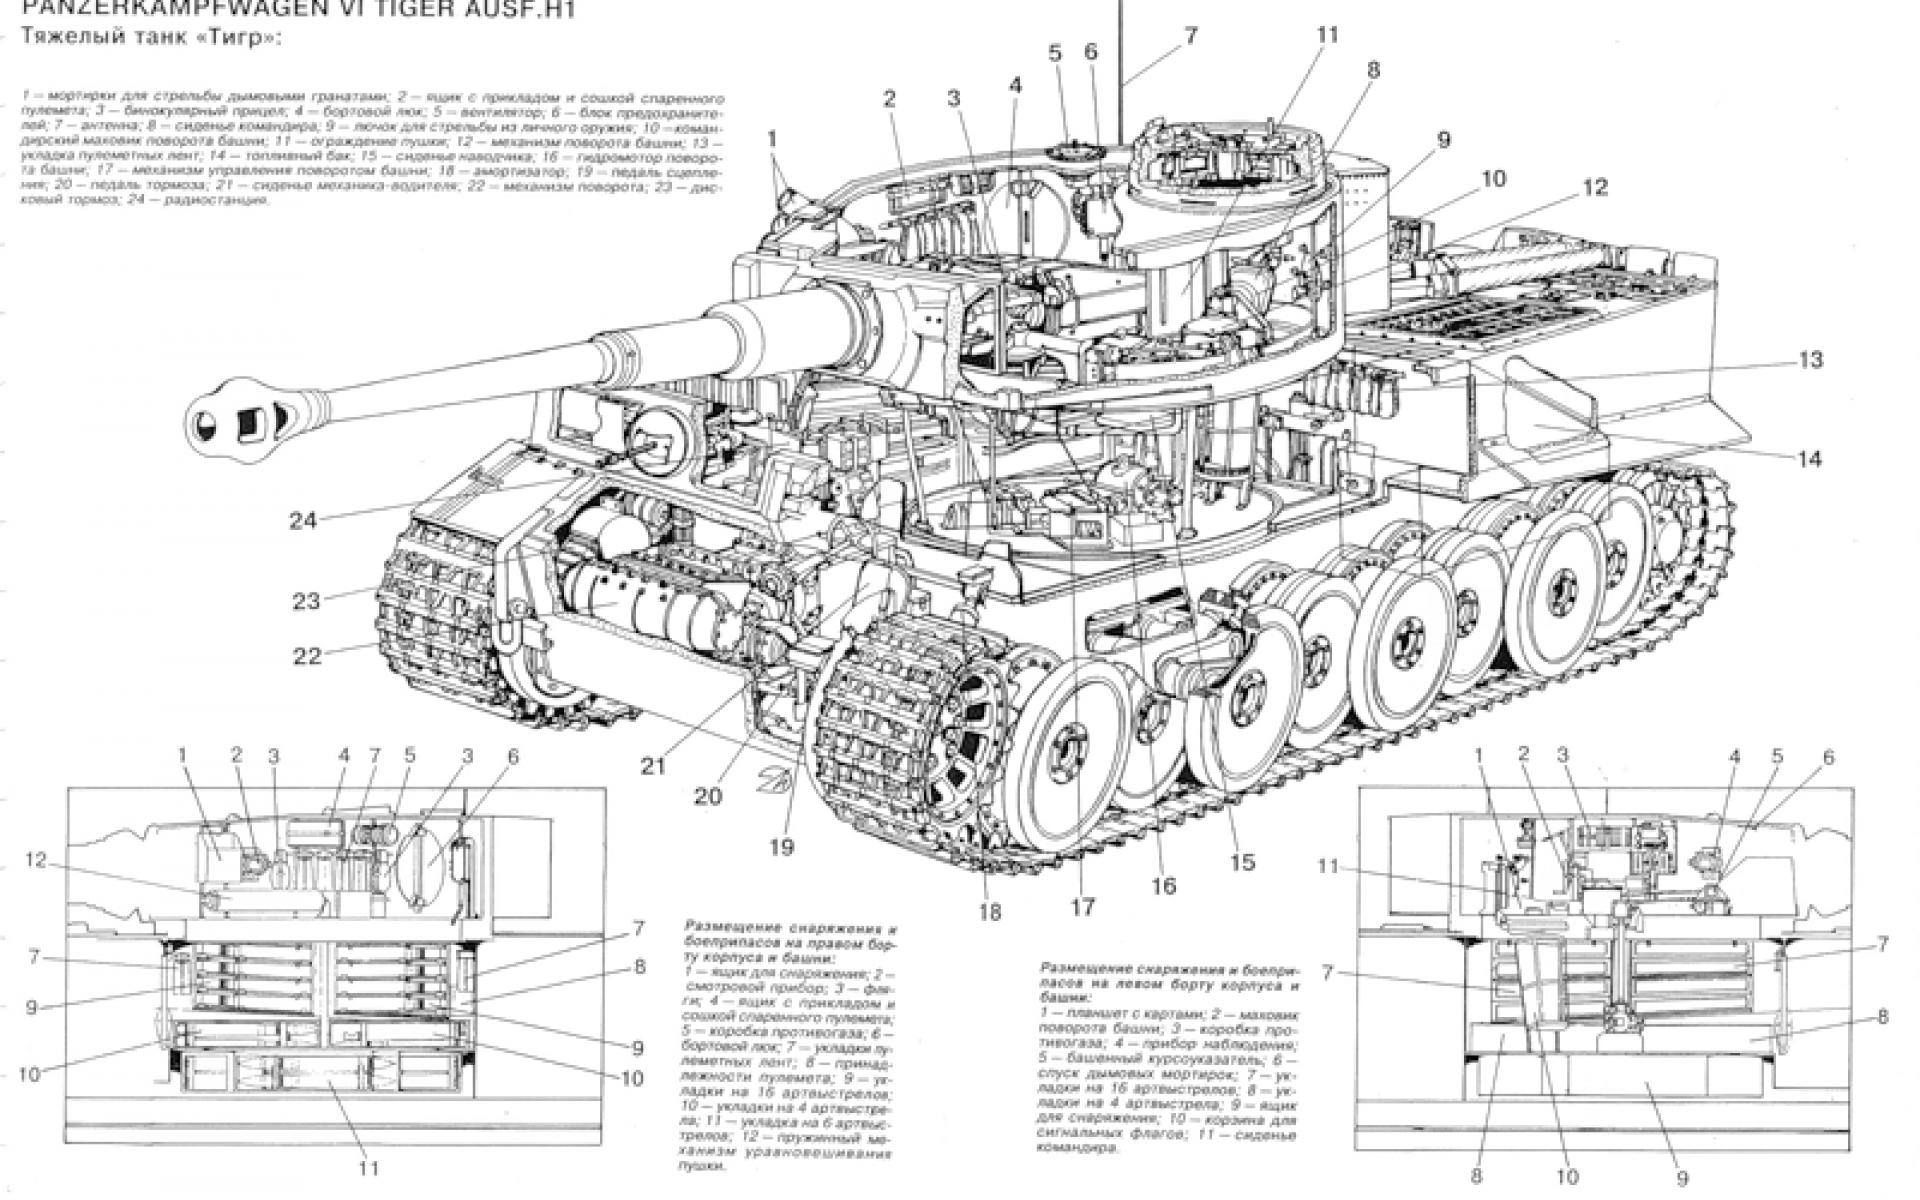 Pin By Carlos Tellez On Worl War 2 German Tanks